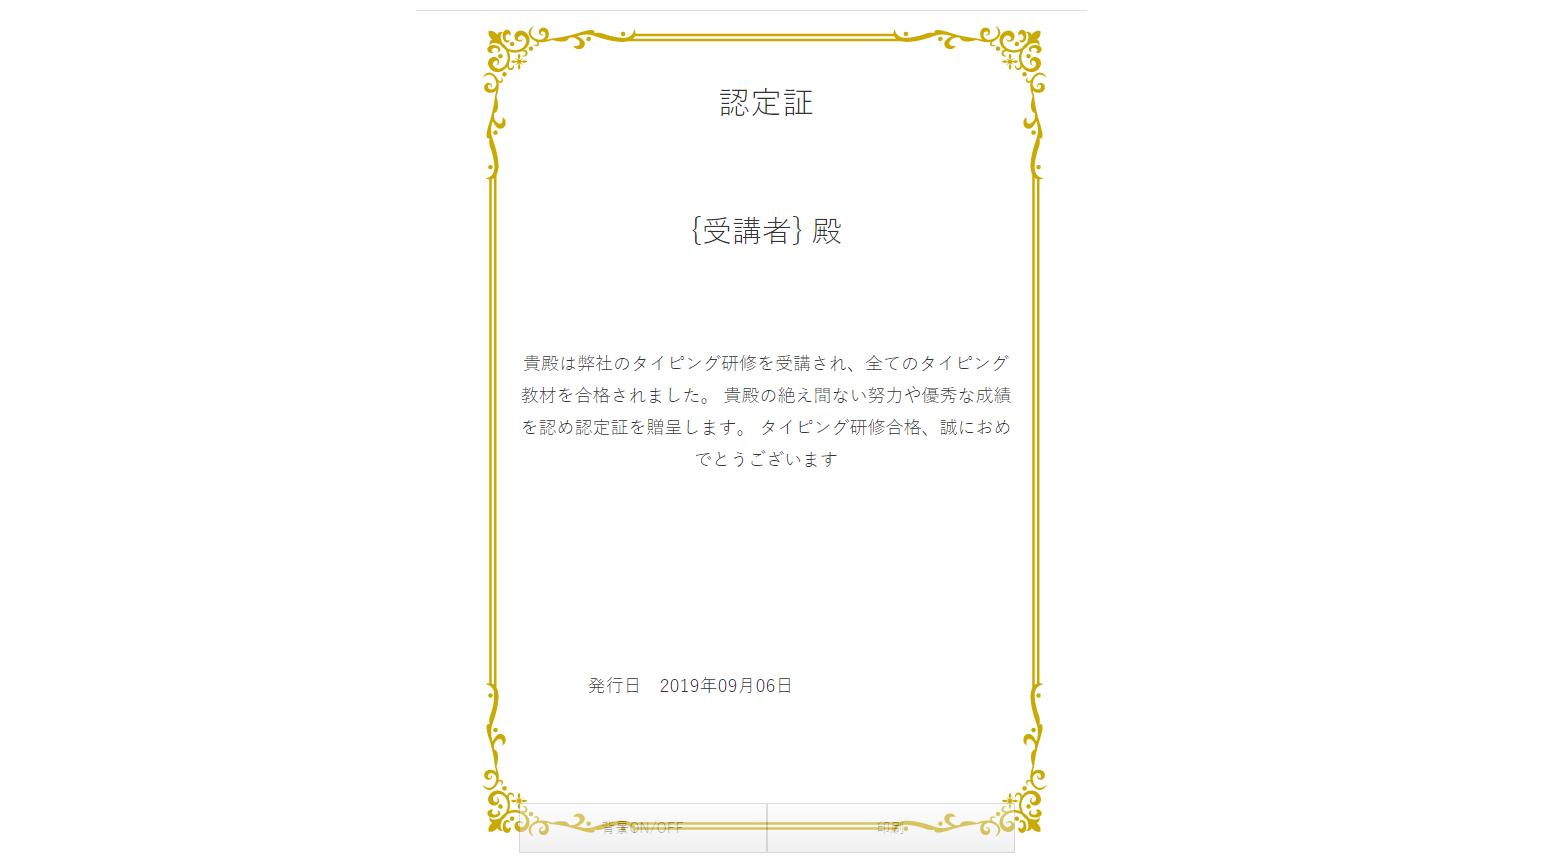 learningBOXタイピング教材_認定証